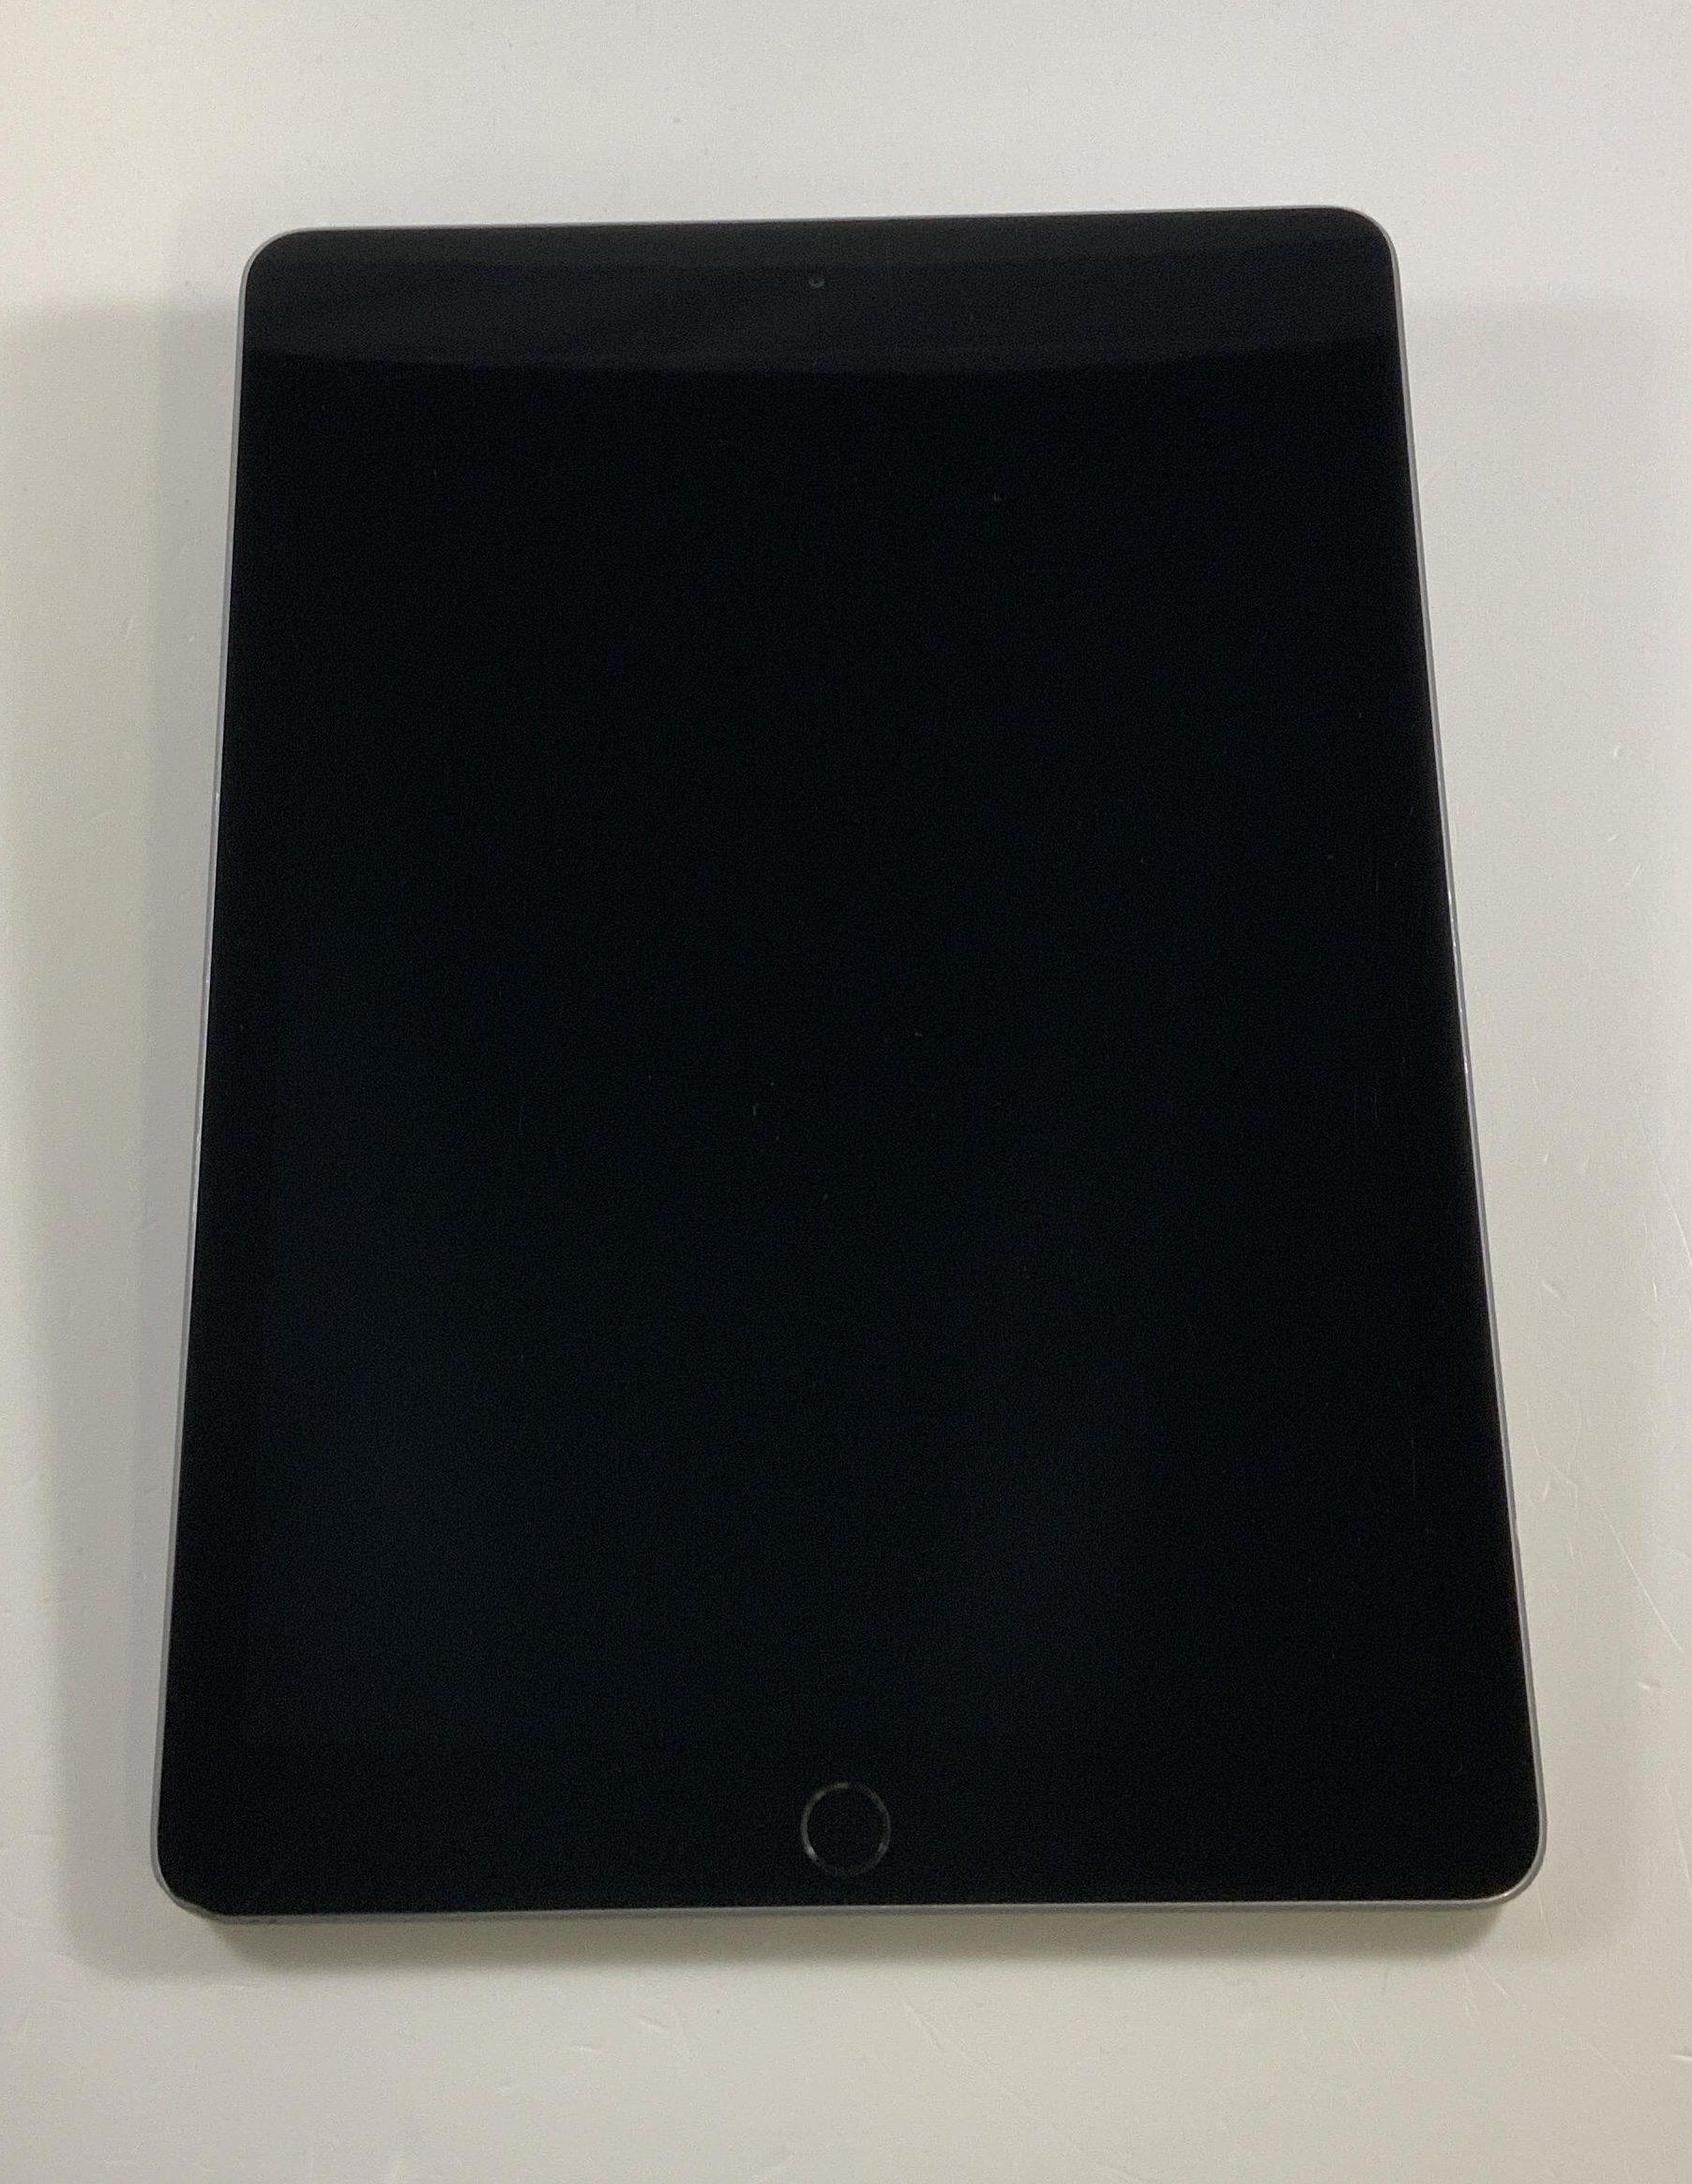 iPad 6 Wi-Fi 128GB, 128GB, Space Gray, Kuva 1